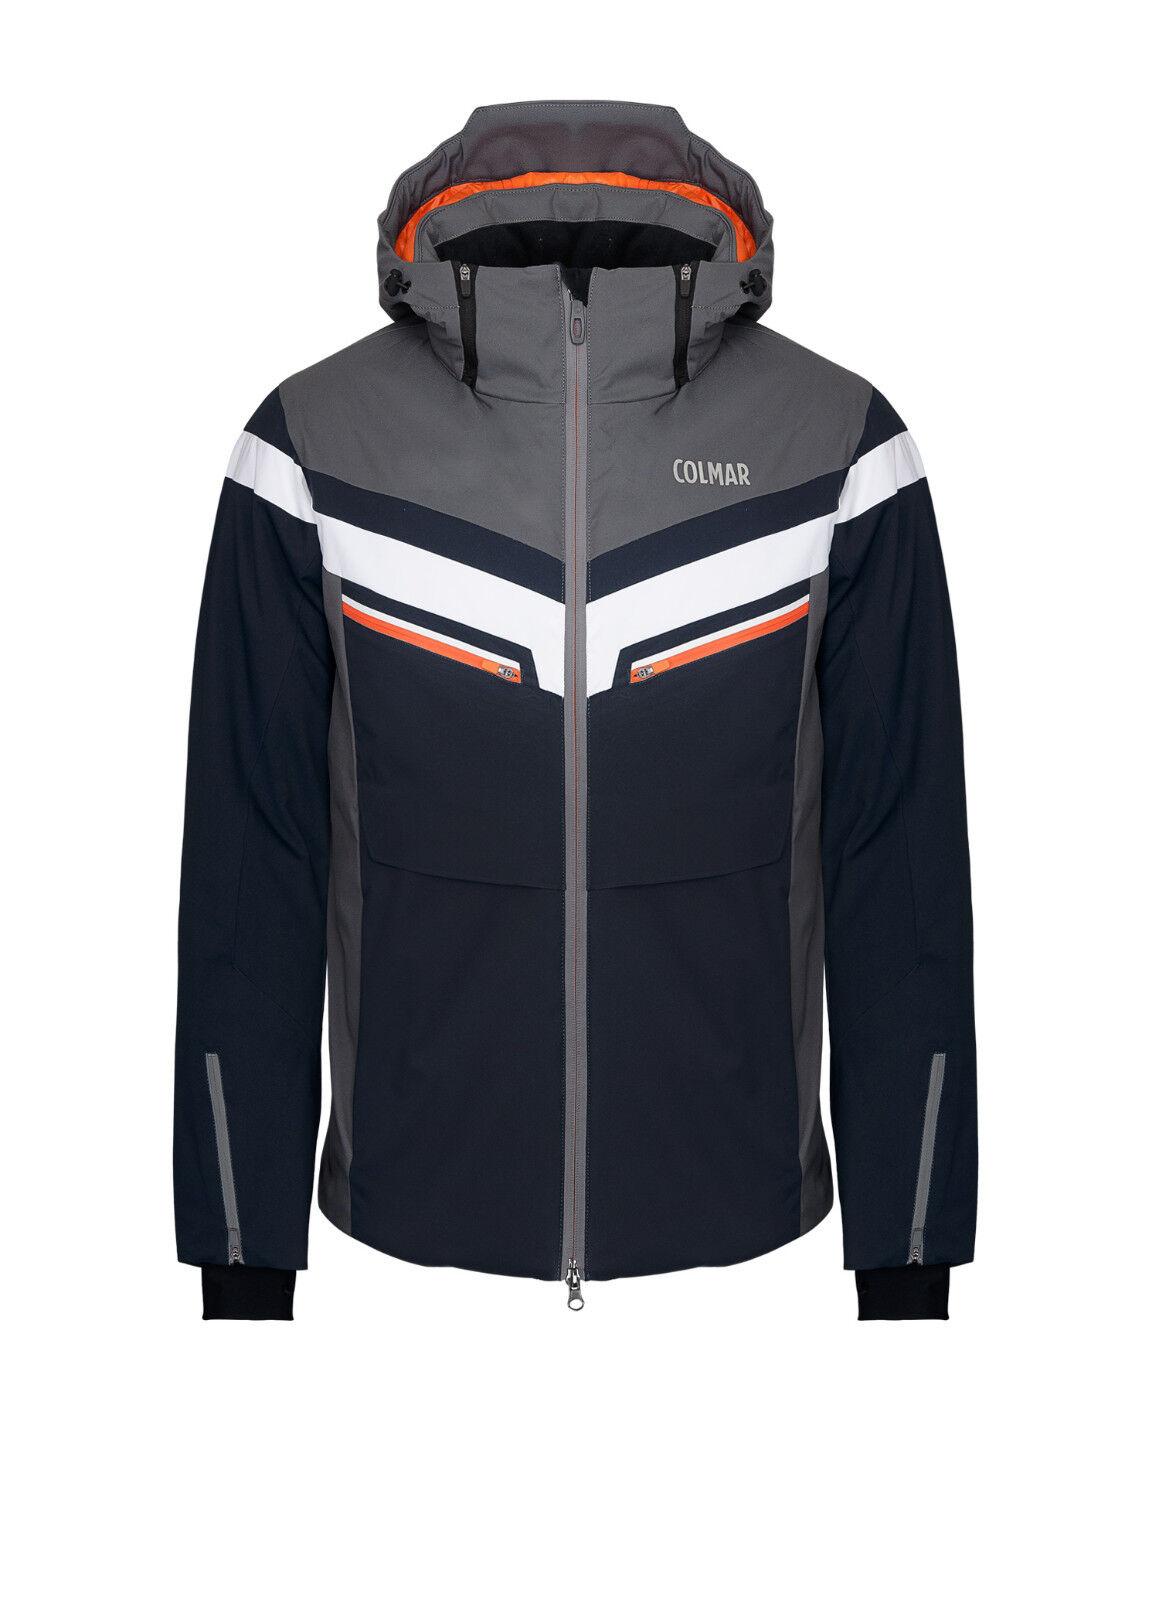 Skijacke Herren Linie Alpne Colmar Mod. 1349 Saison 2017 2018